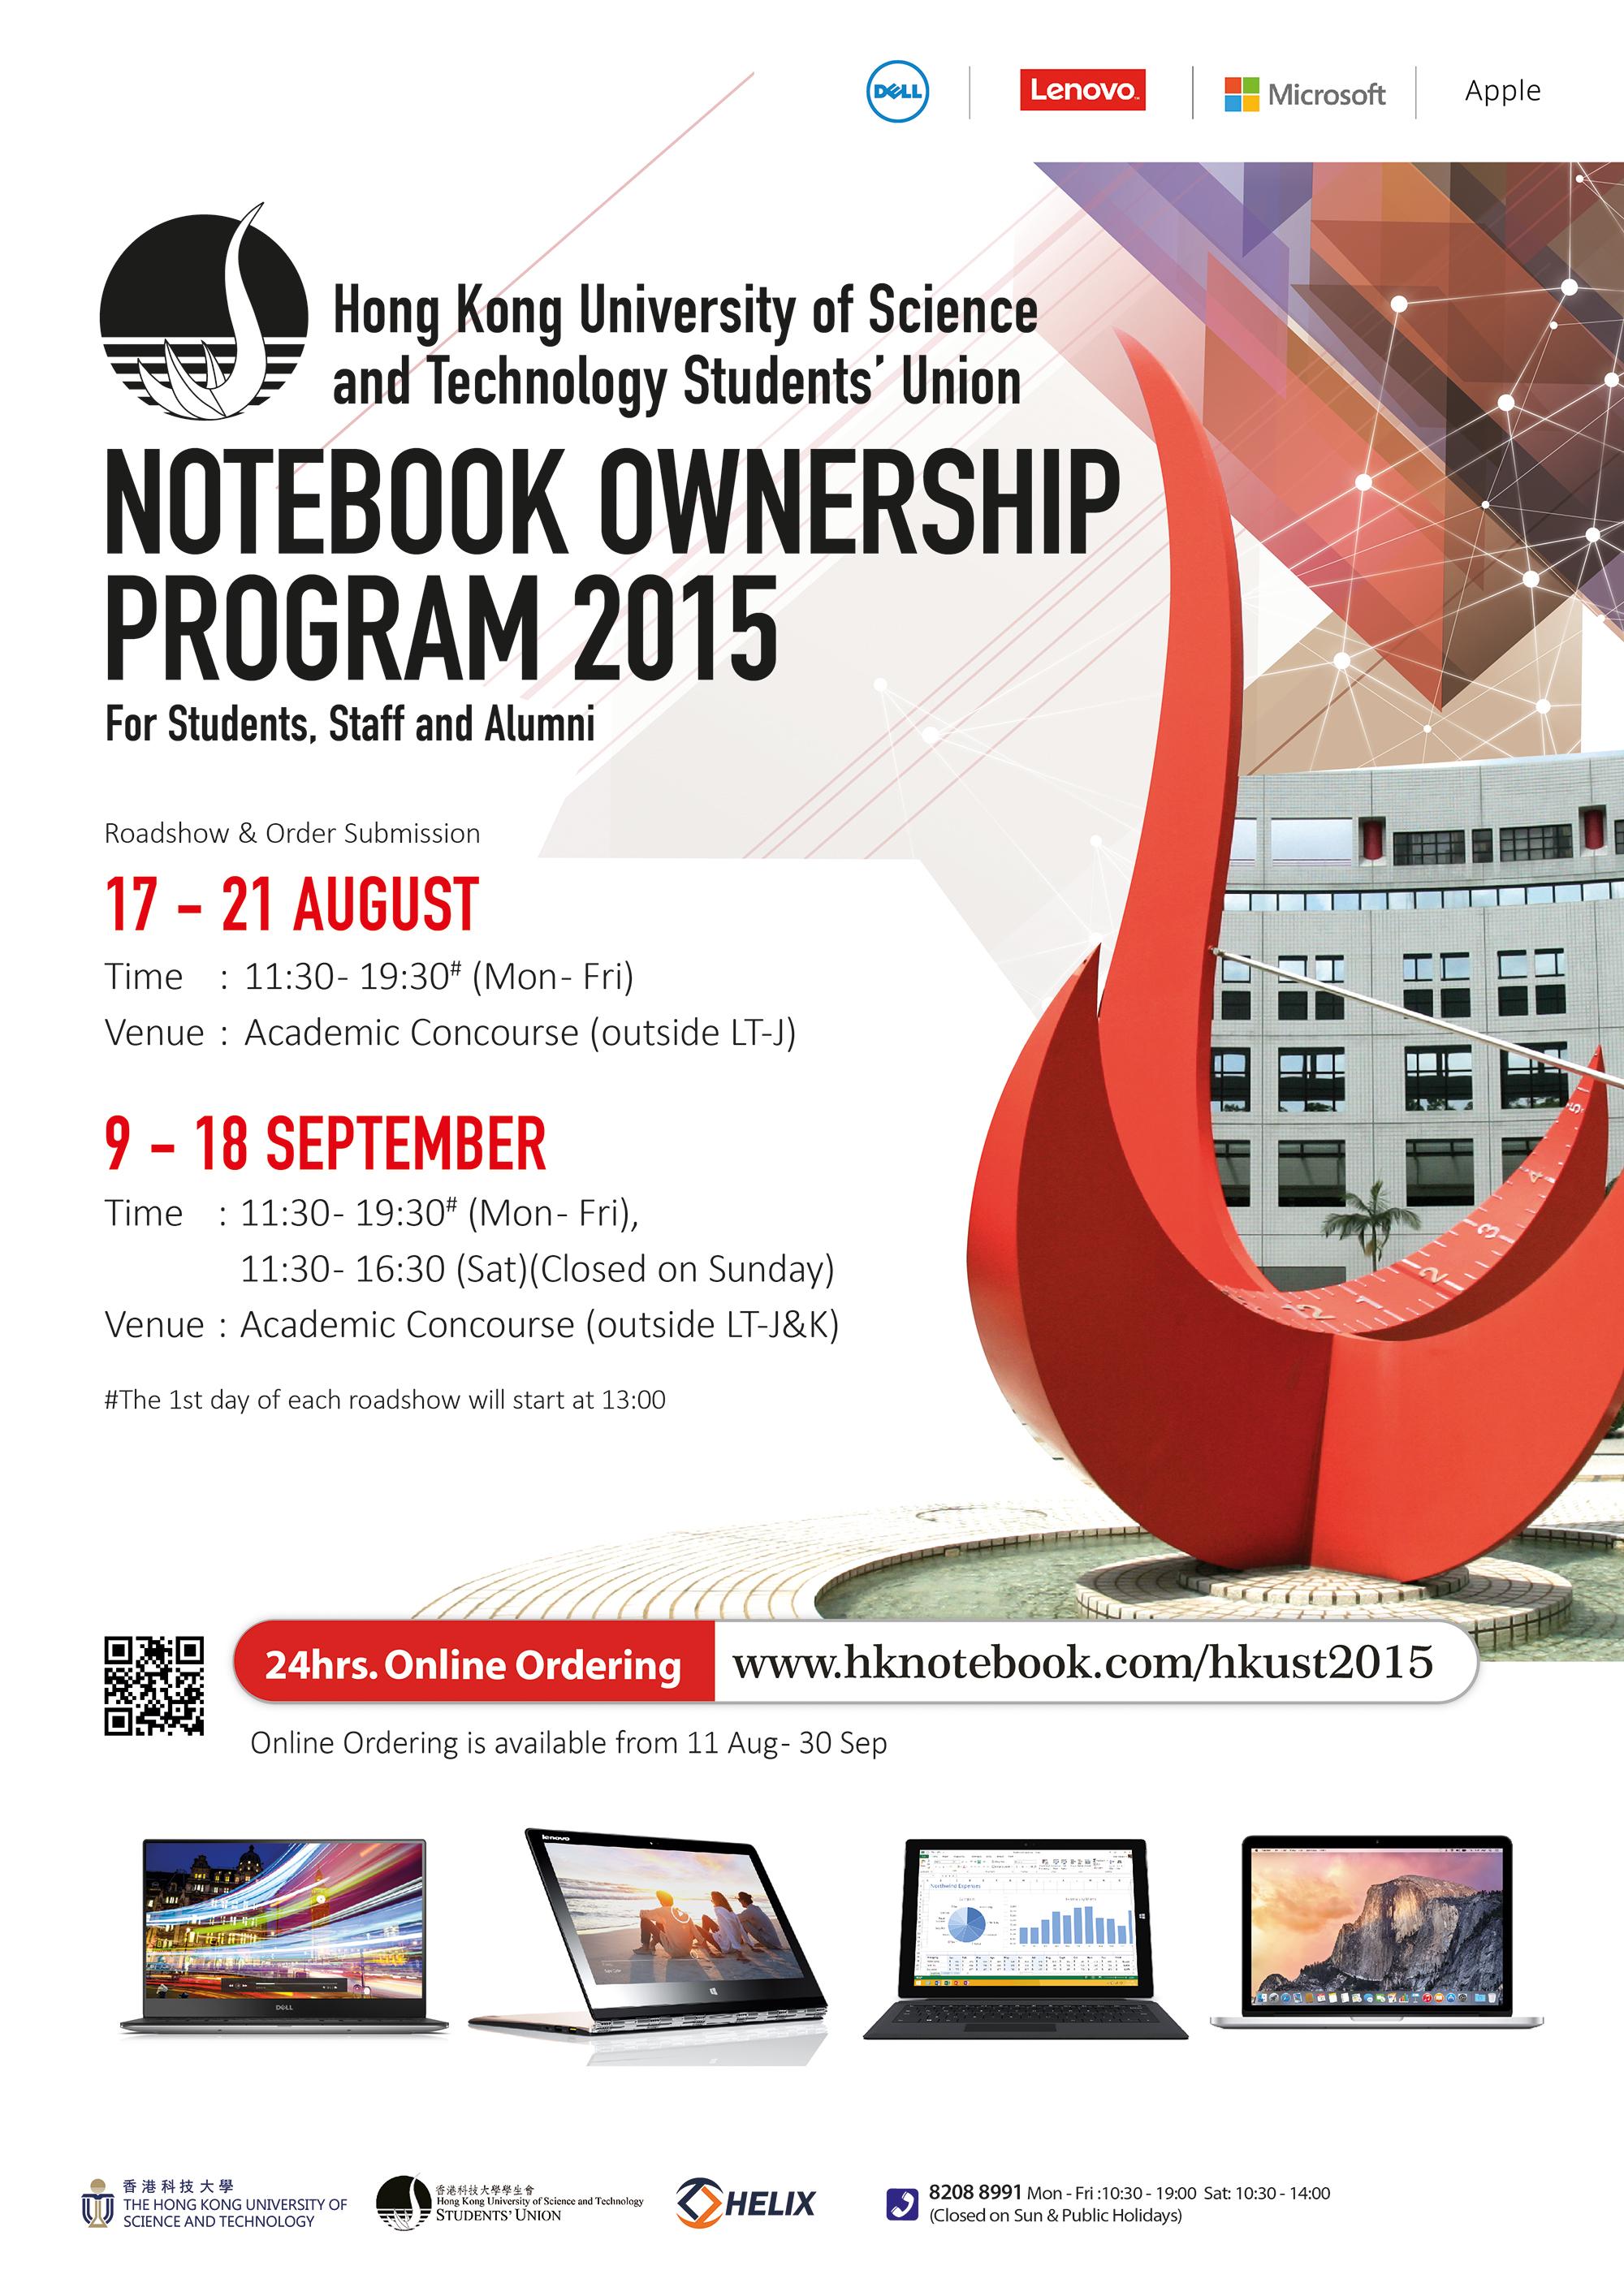 HKUST Notebook